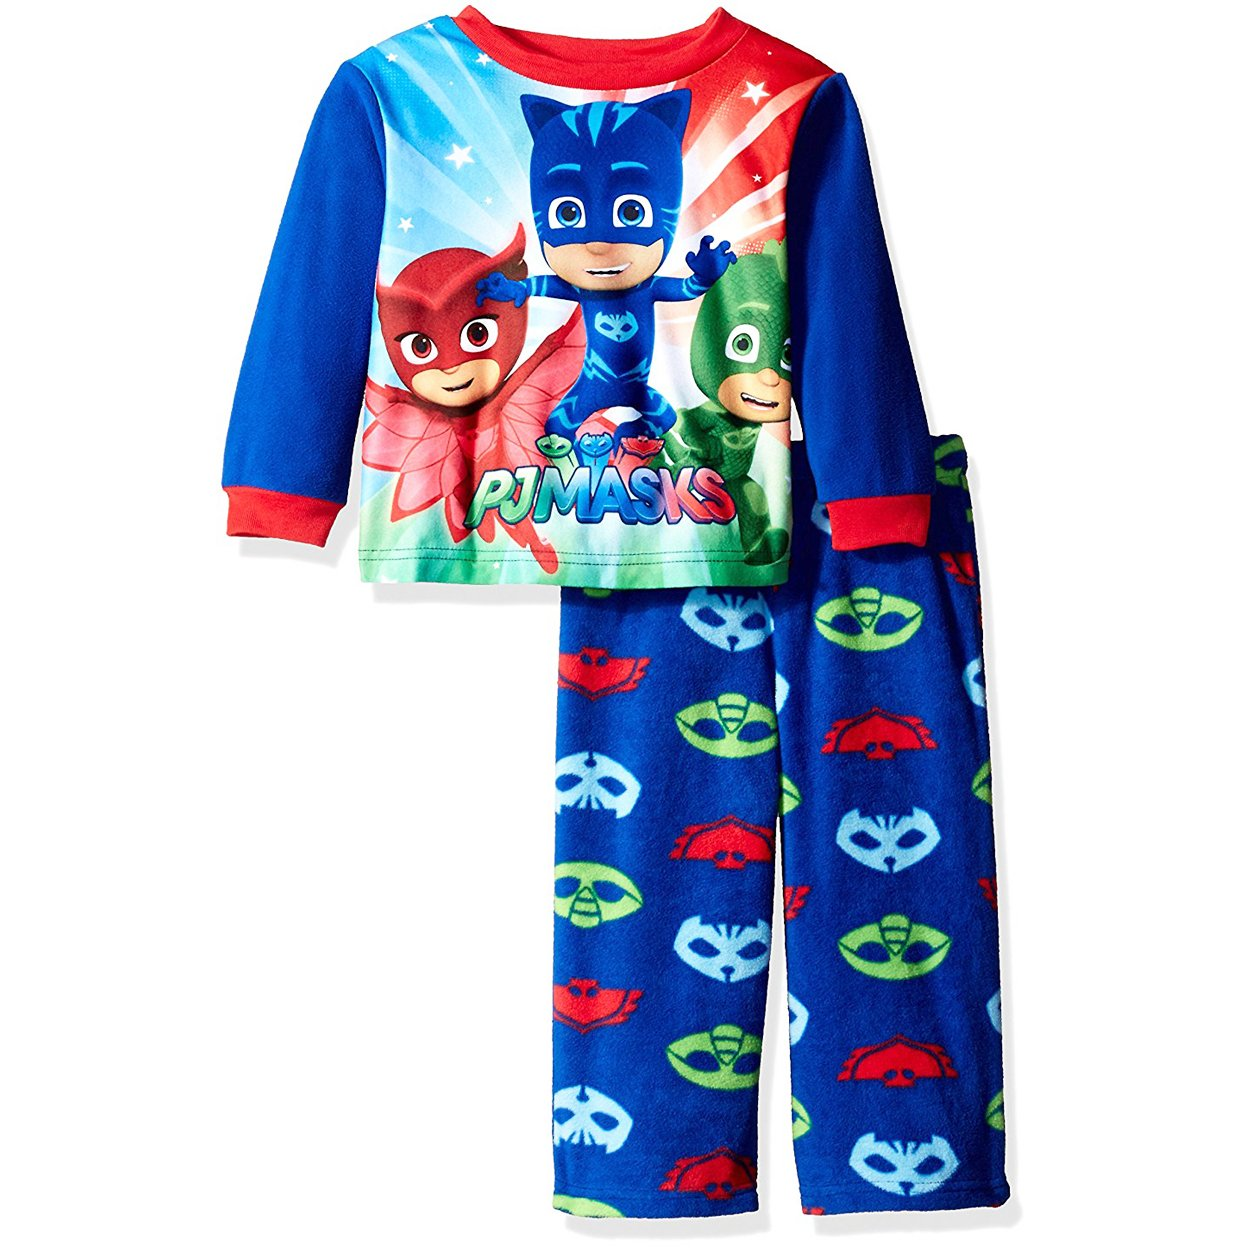 c39204cb1dd4 Amazon.com  AME Boys Pj Masks 2-Piece Fleece Pajama Set (Catboy ...